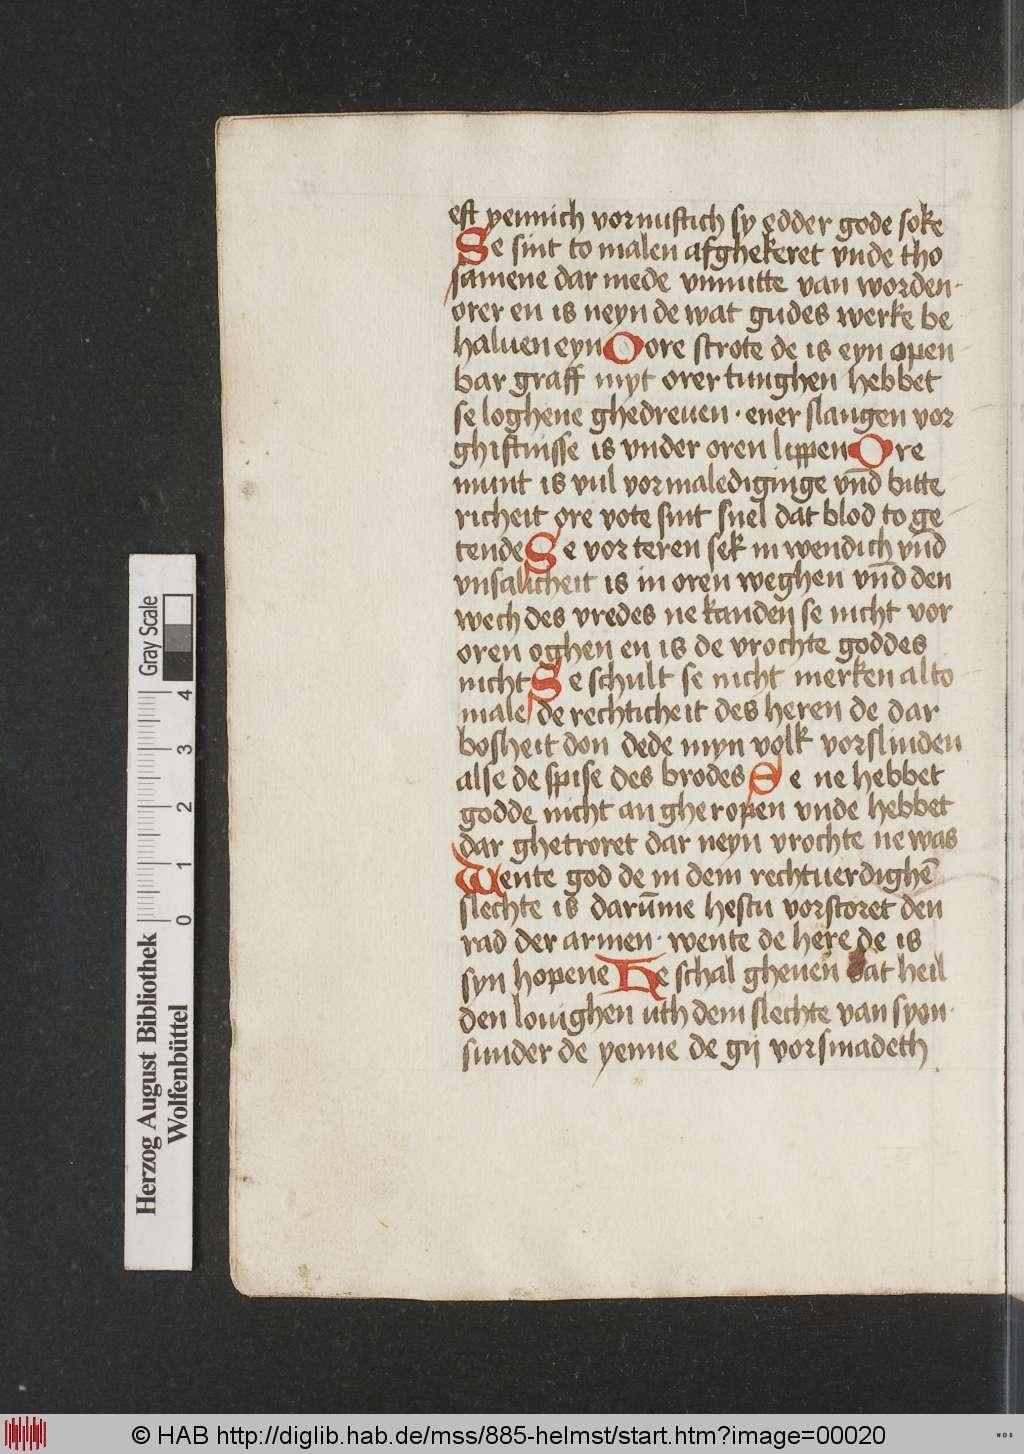 http://diglib.hab.de/mss/885-helmst/00020.jpg